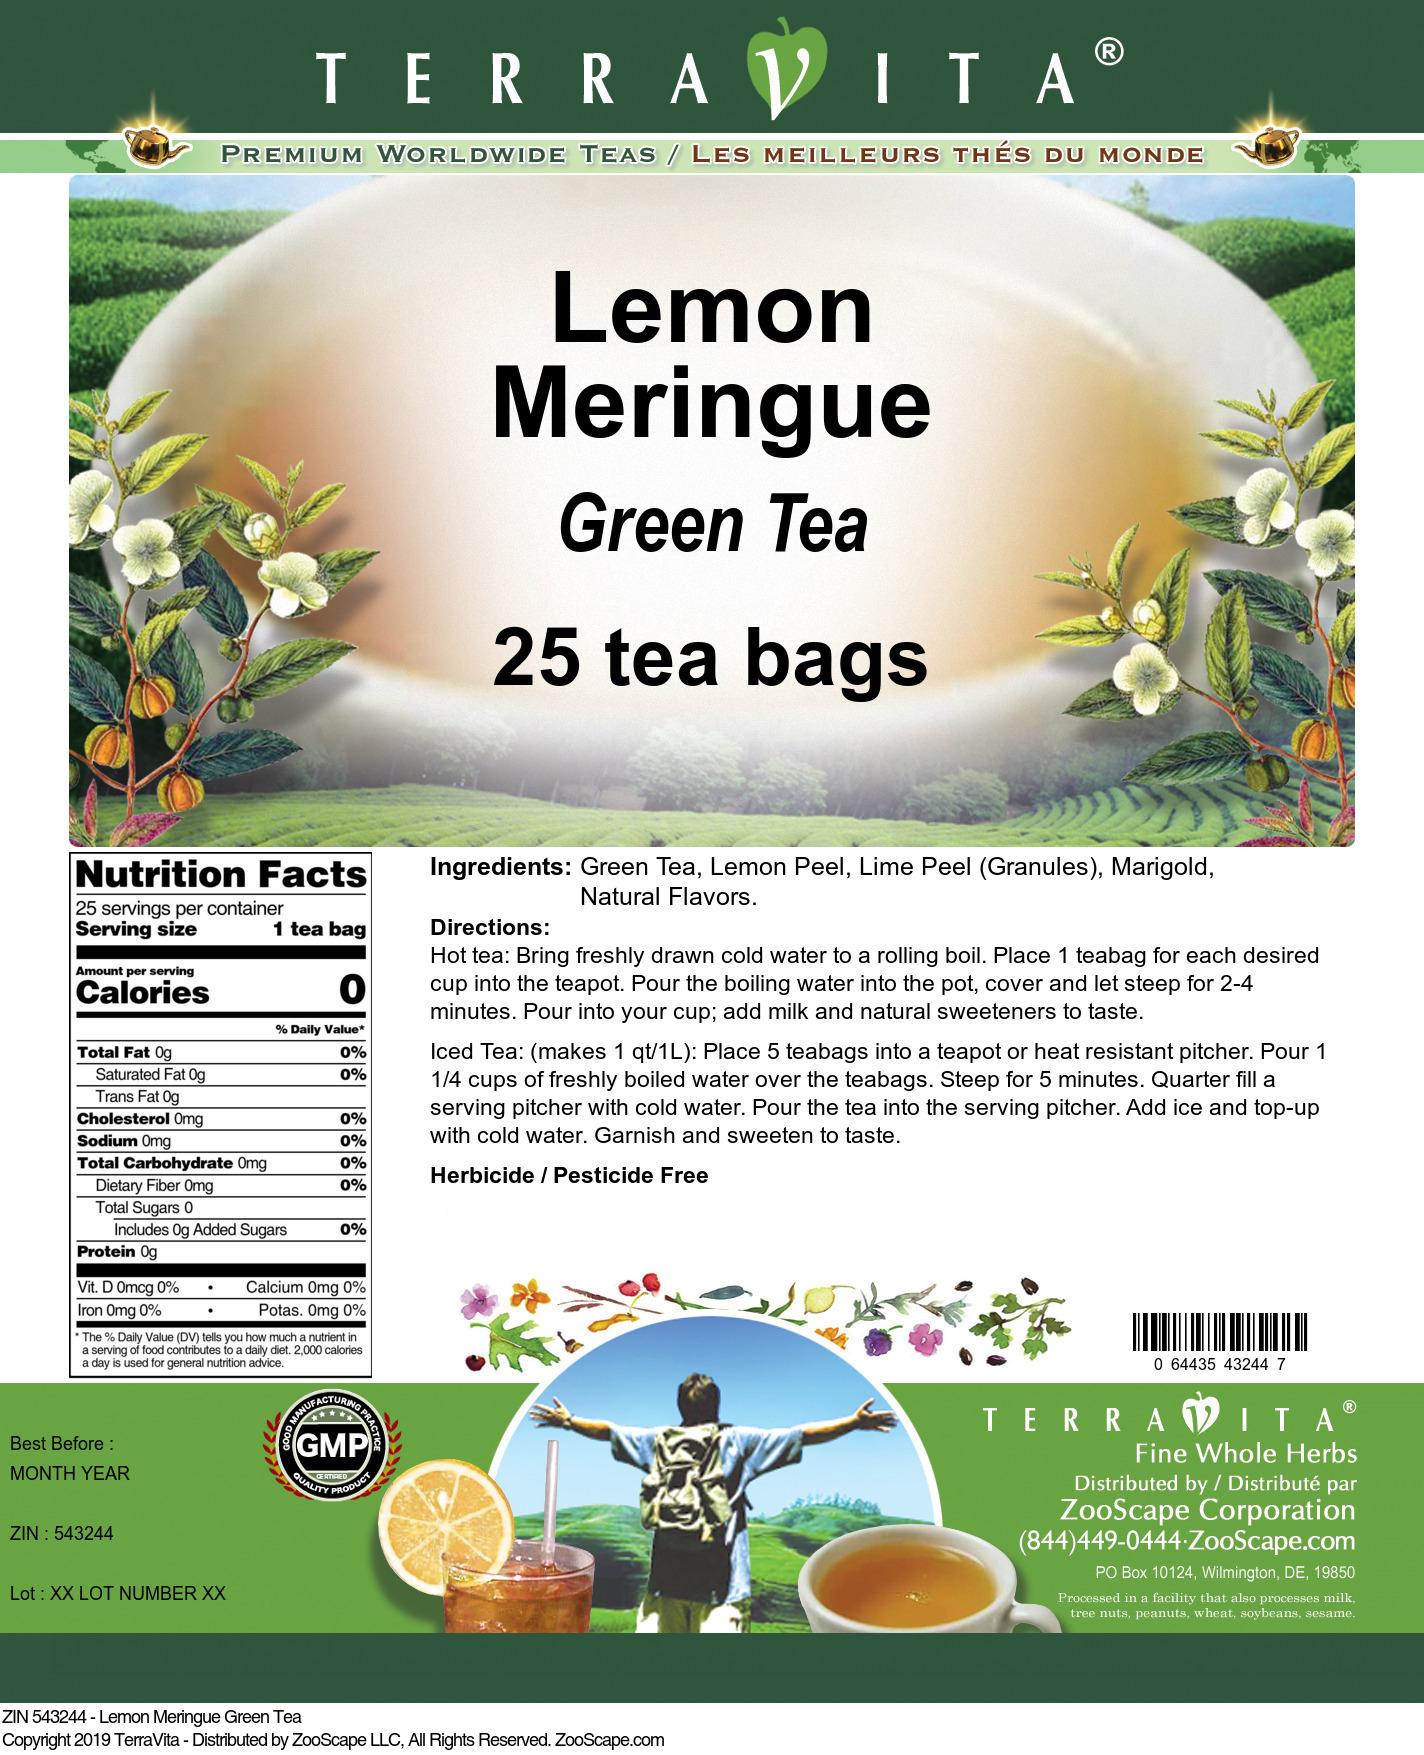 Lemon Meringue Green Tea